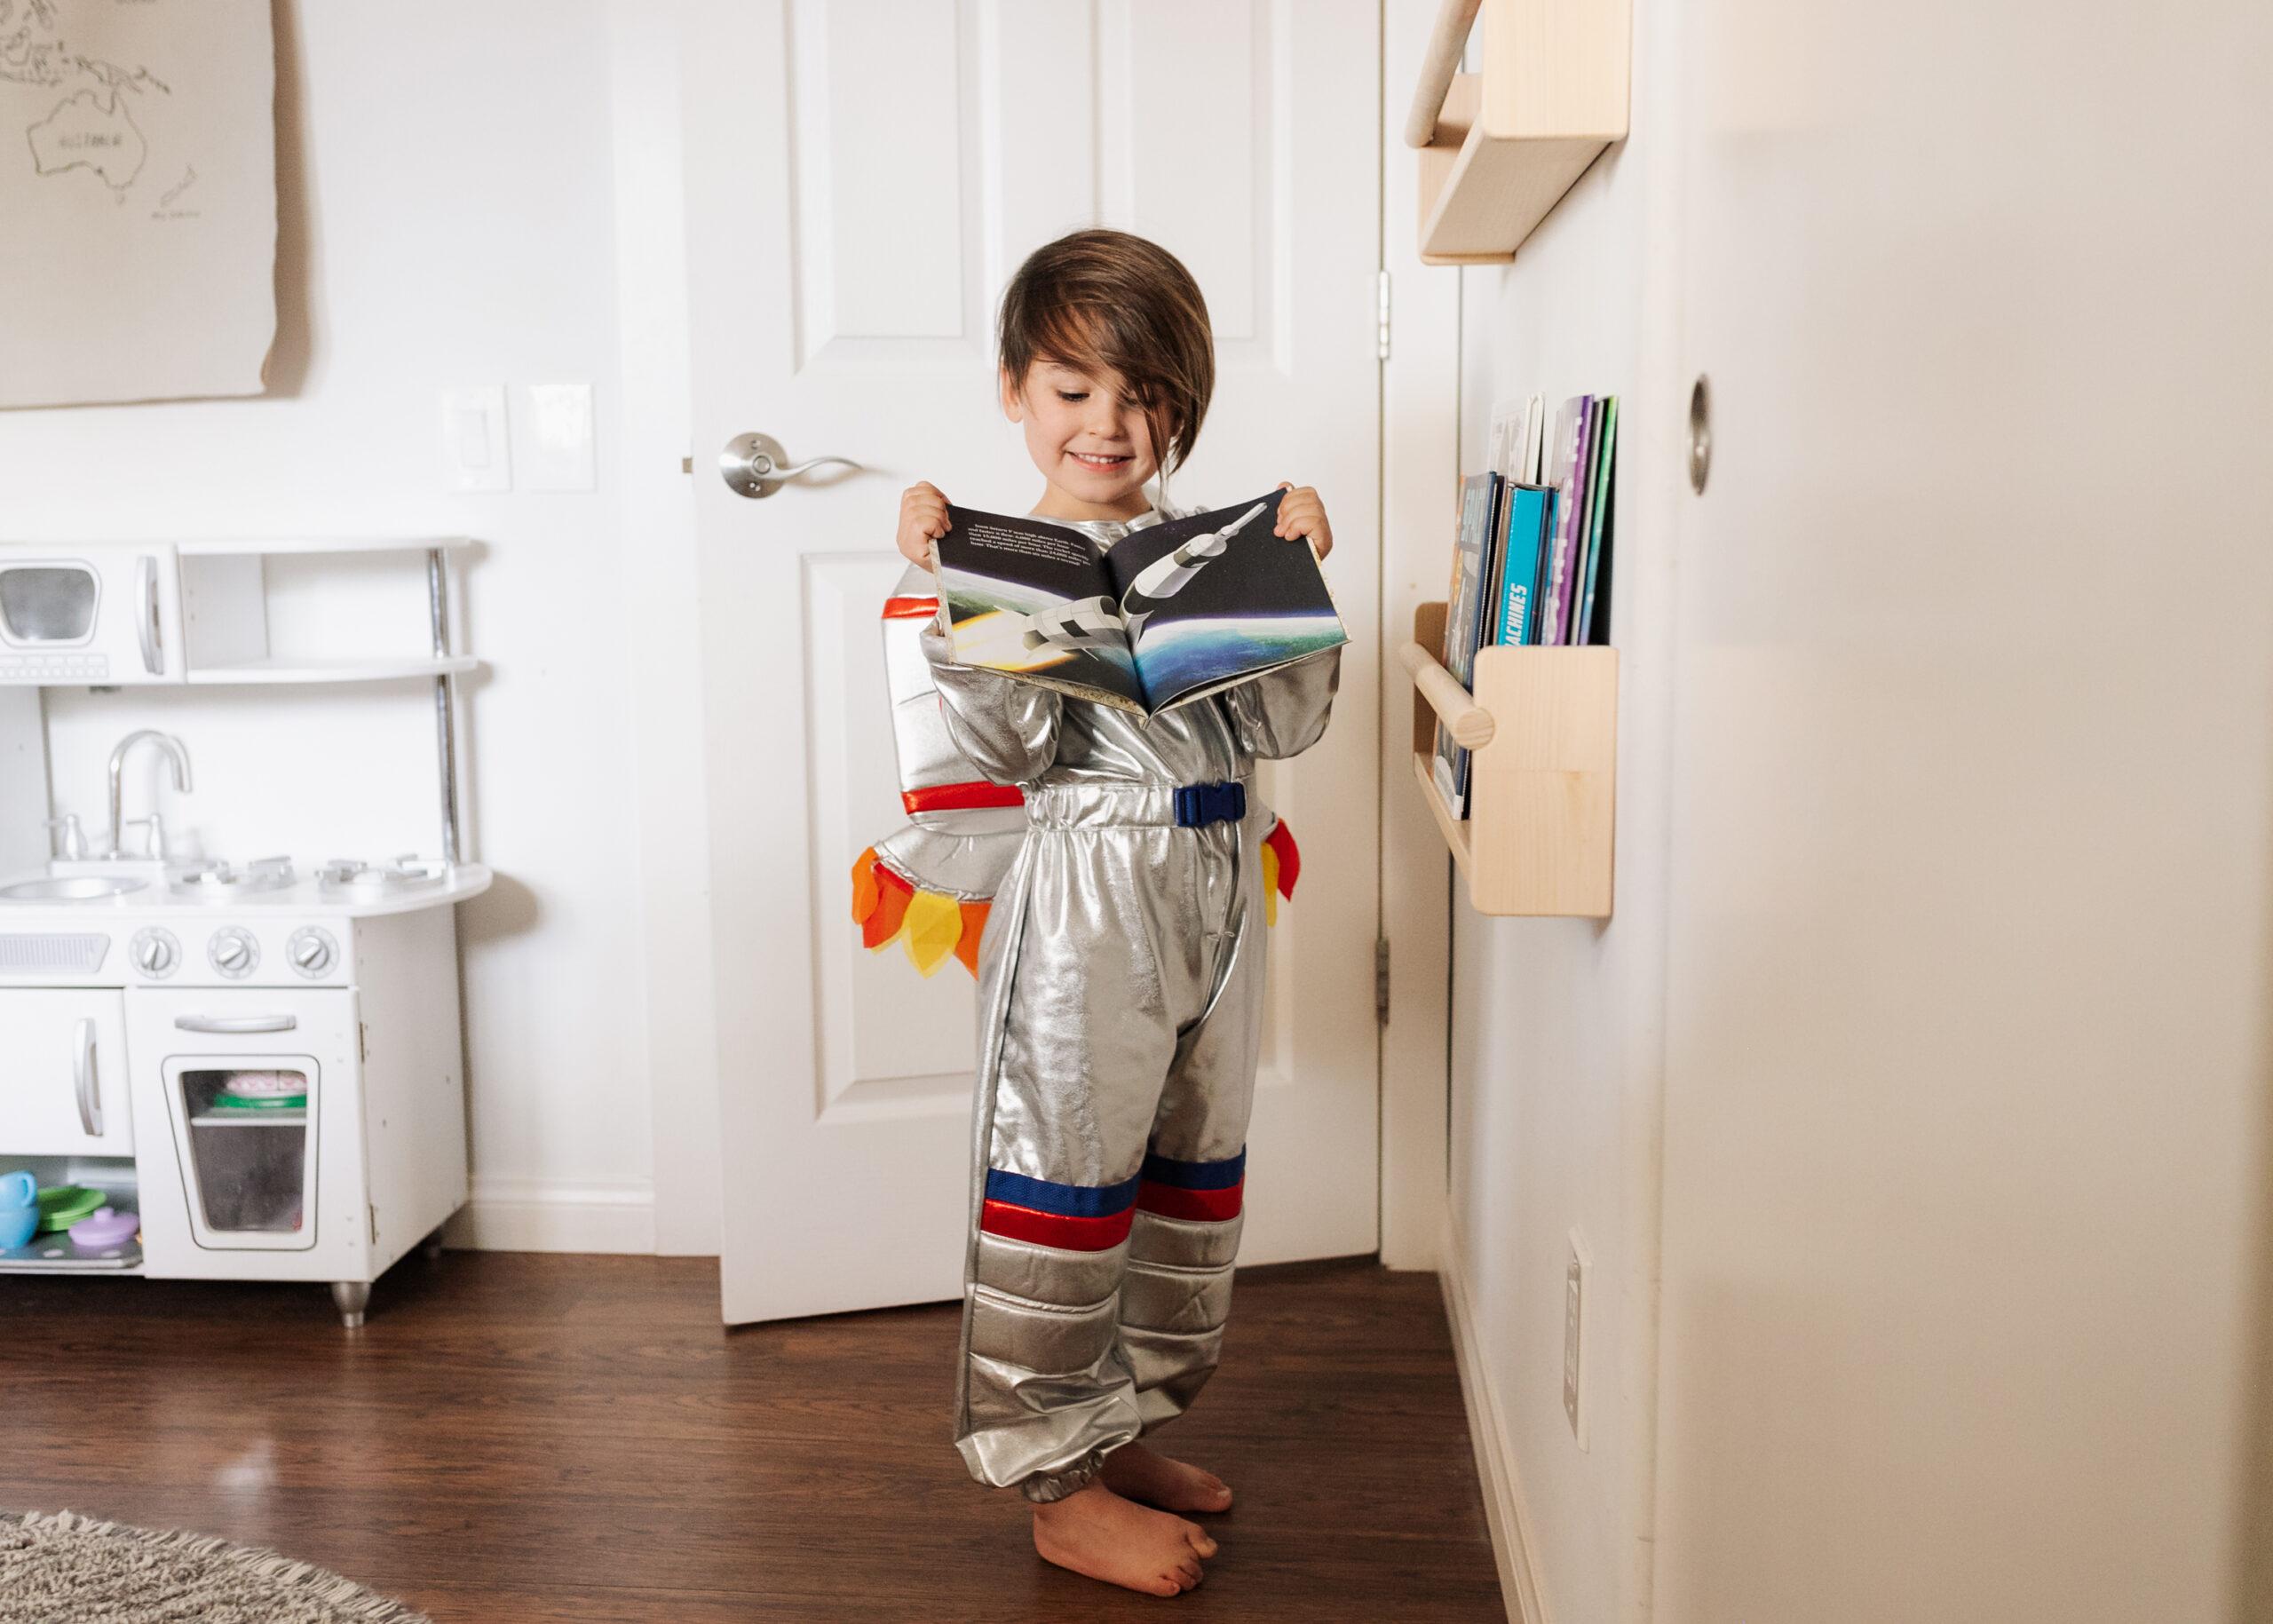 all the space books for my space inspired boy #spaceroom #astronautcostume #bigboyroom #kidsroom #homedesign